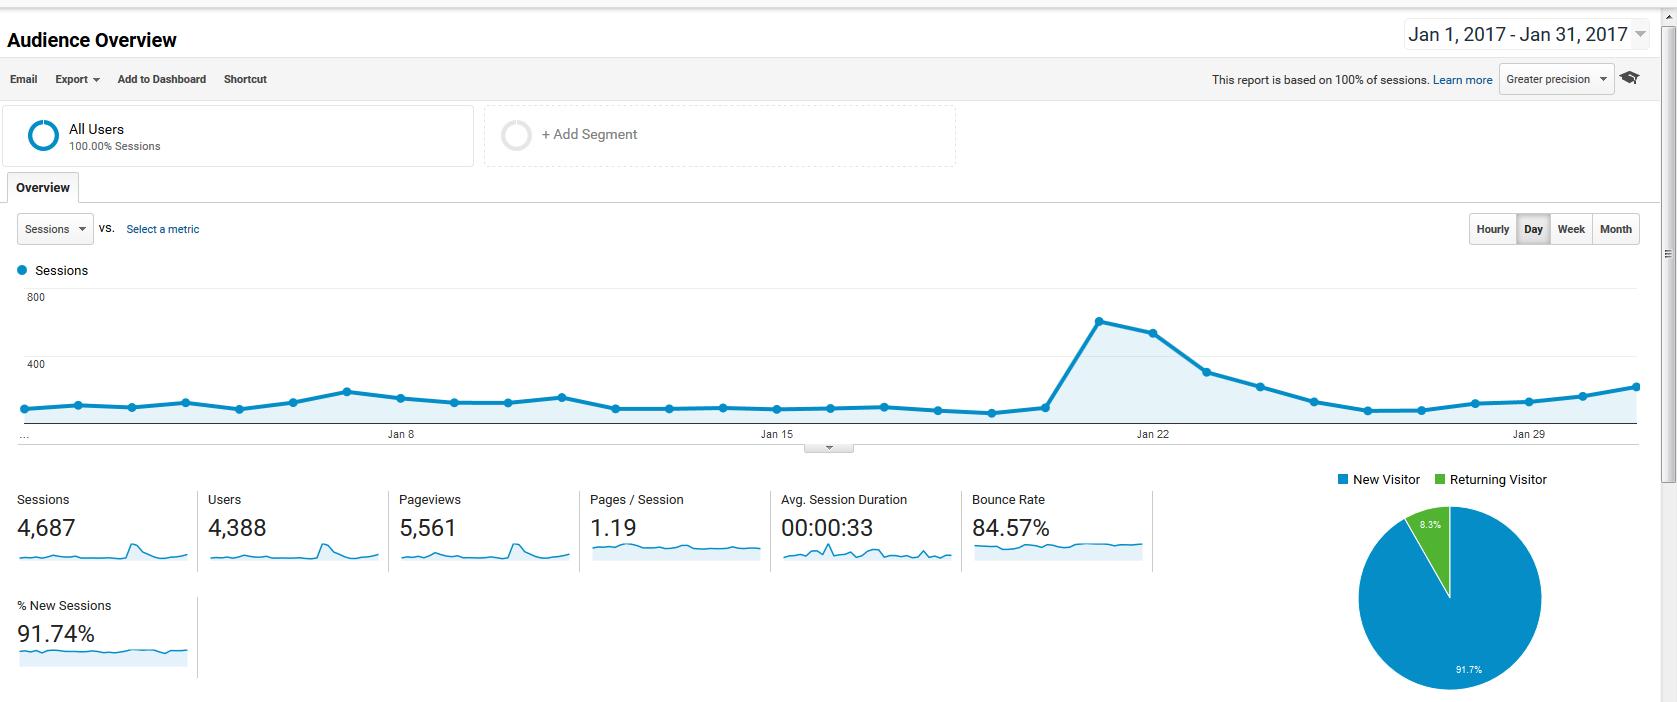 January 2017 Page Views Google Analytics Screenshot   https://www.roseclearfield.com